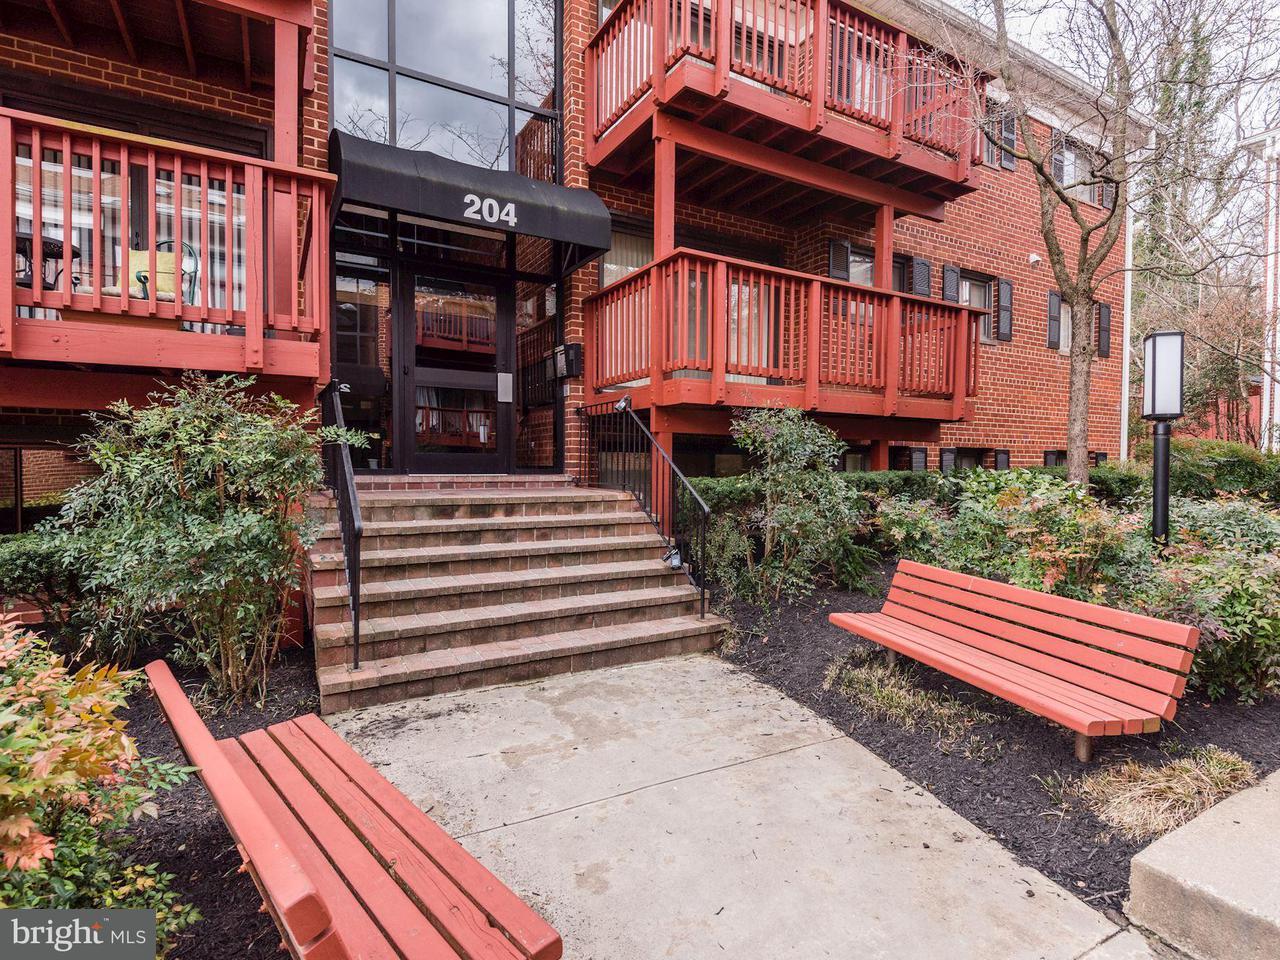 204 Skyhill Rd #9 Unit 9Alexandria VA 22314 MLS Number 1000391814 & 204 Skyhill Rd #9 Alexandria VA Real Estate Listing | MLS# g ...